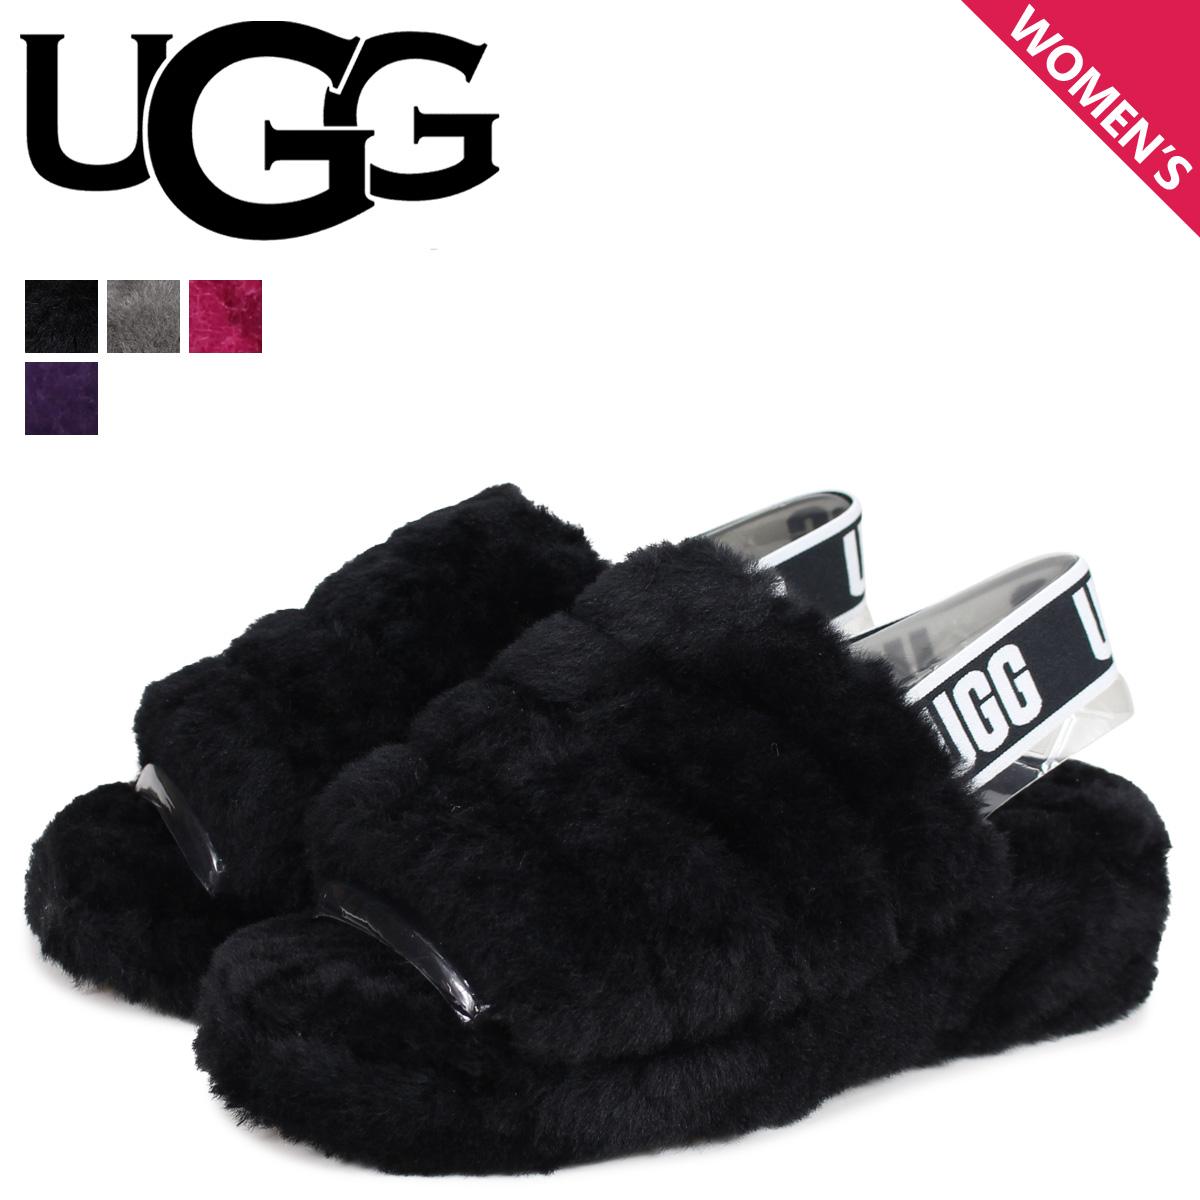 03cc9d044 UGG アグサンダルムートンフラッフイヤースライドレディース WOMENS FLUFF YEAH SLIDE black charcoal black  1095119